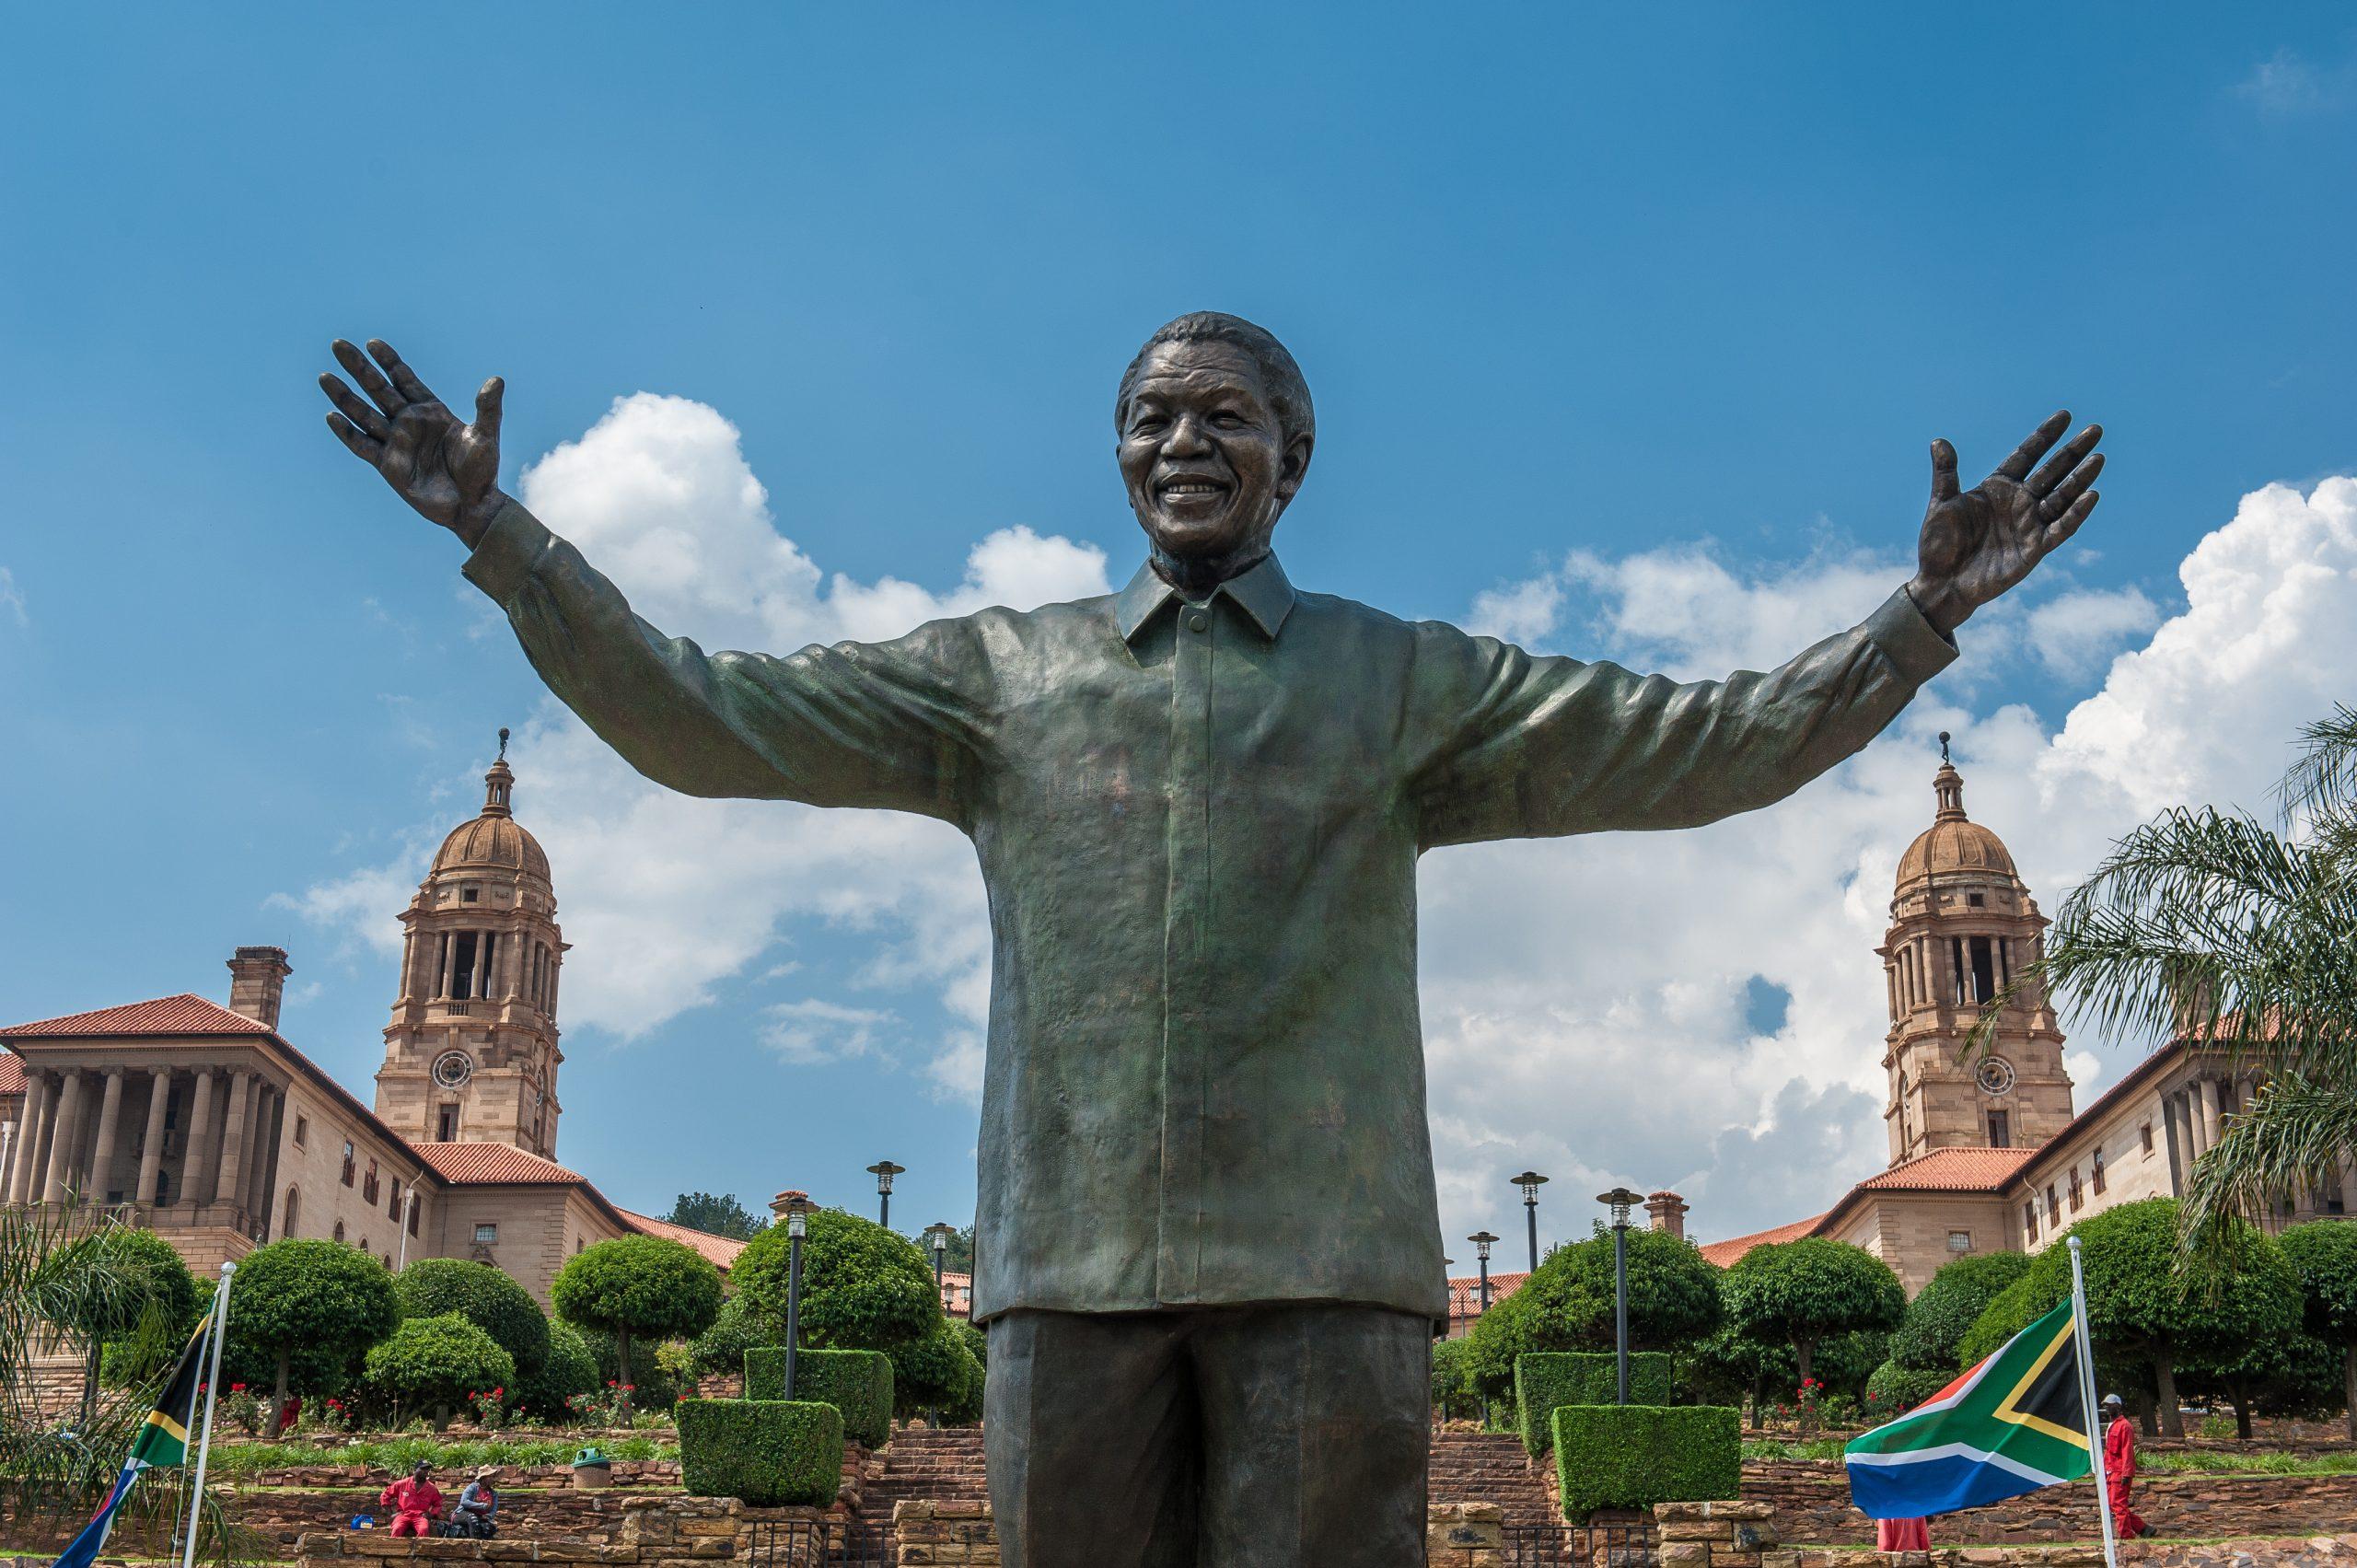 10 curiosities about Nelson Mandela